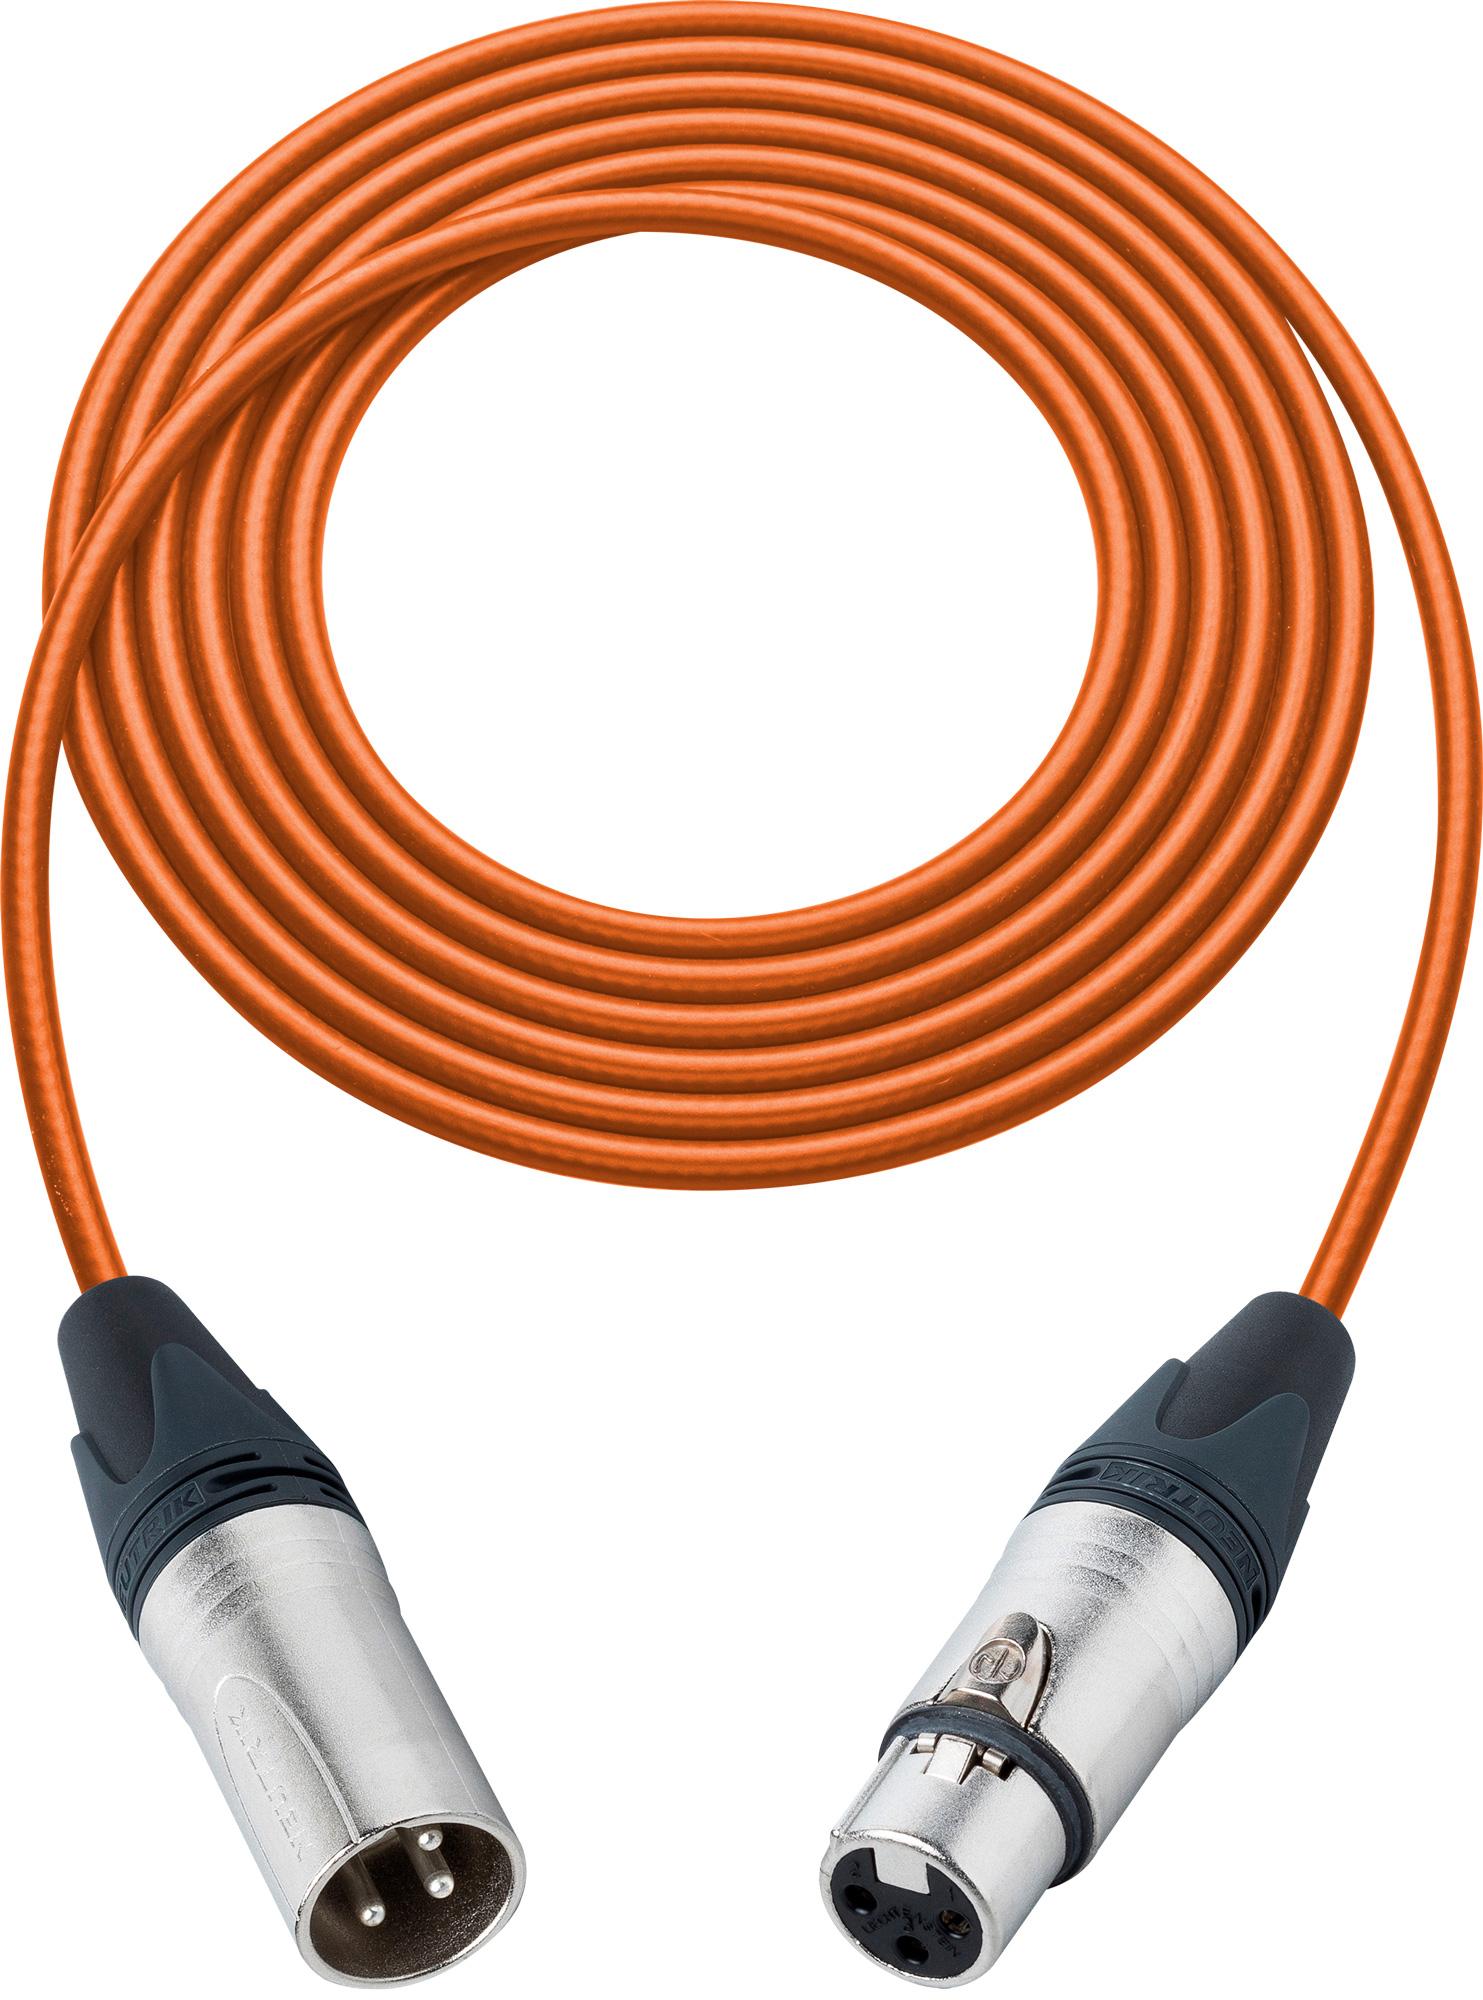 Pro Stage Series XLR Cable - 100 feet ORANGE L2-100XXJOE